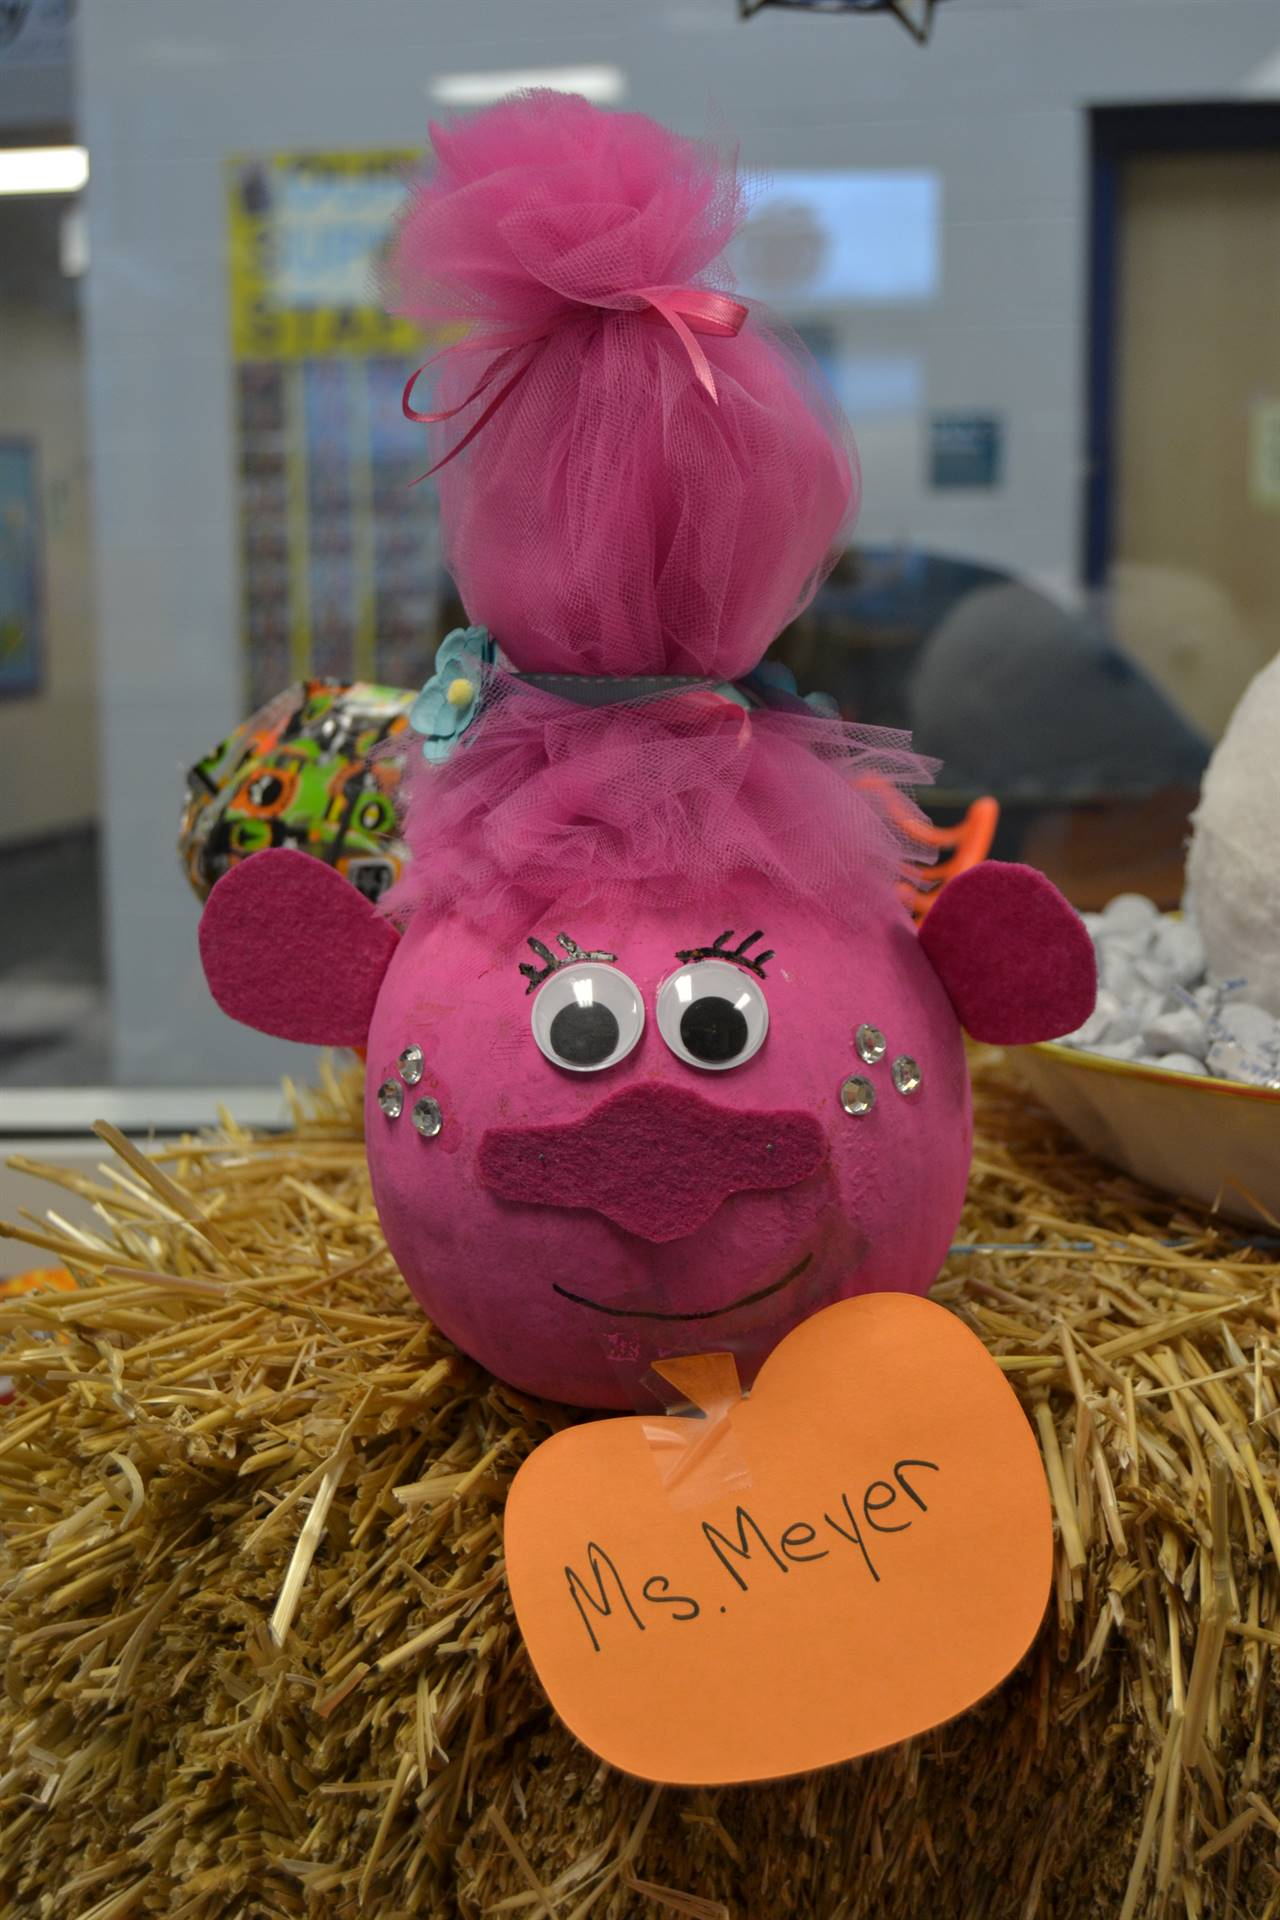 Pumpkin created by Ms. Meyer